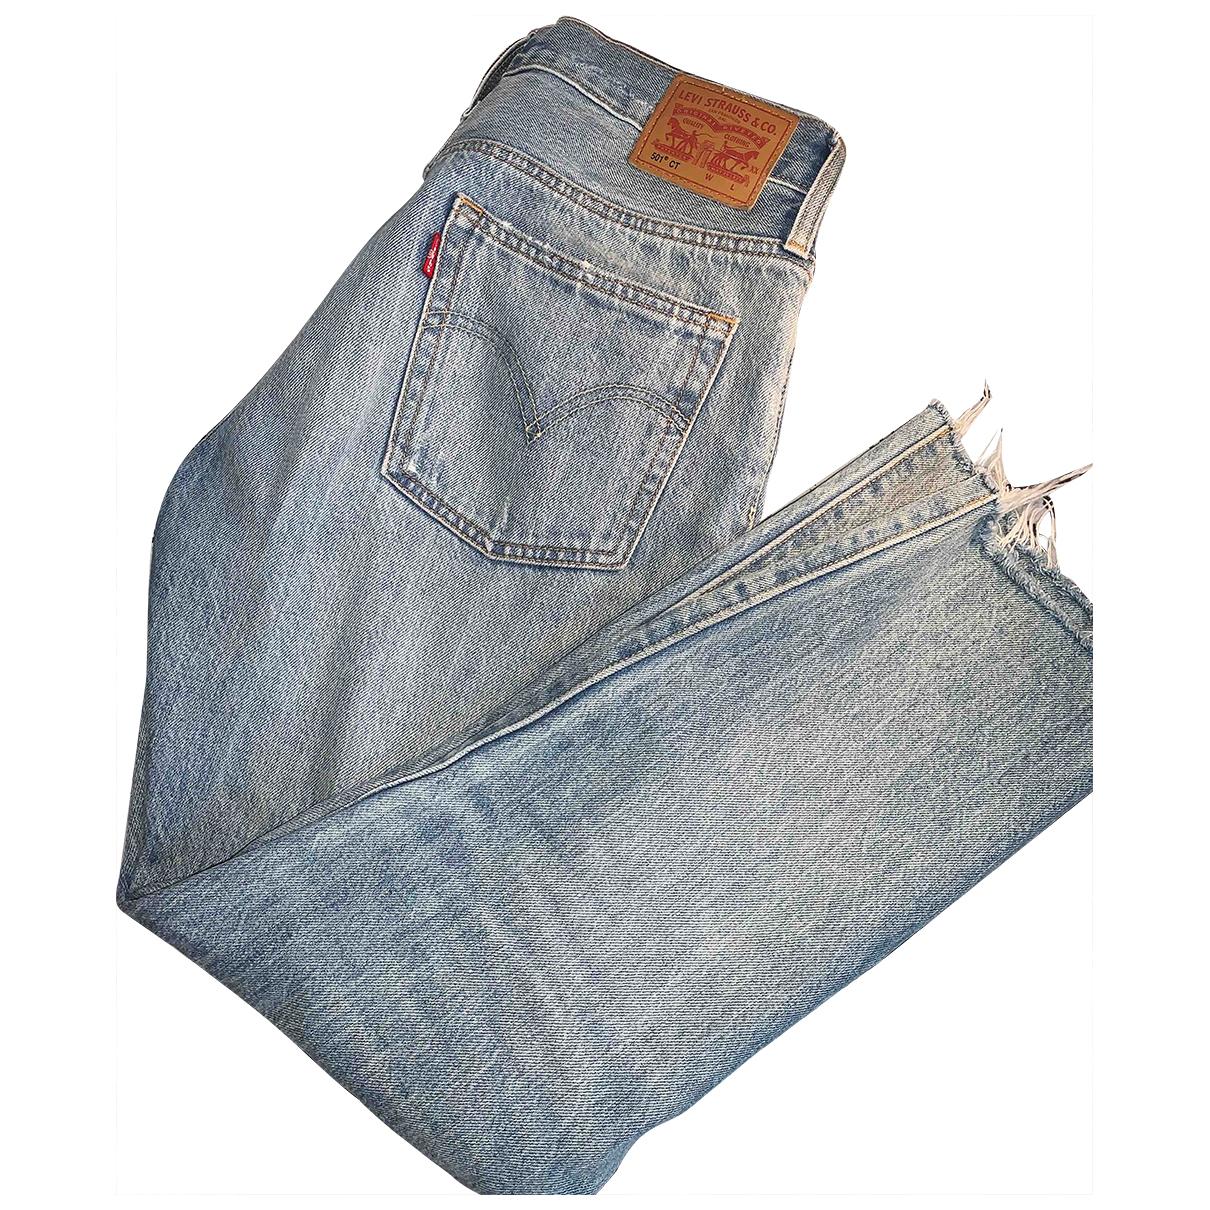 Levi's 501 Denim - Jeans Jeans for Women 40 FR